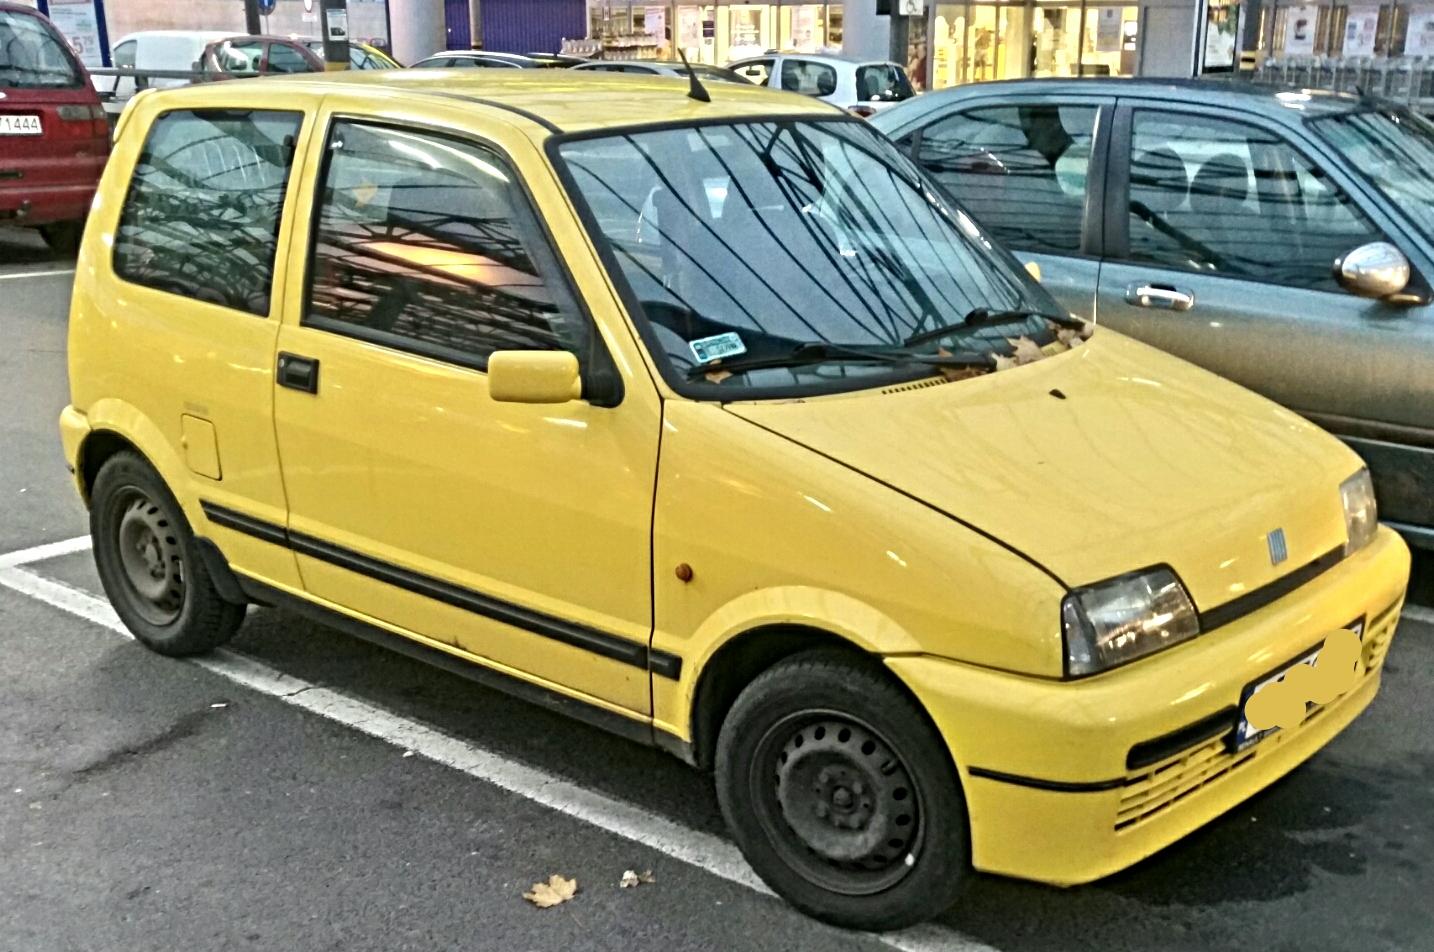 File:Yellow Fiat Cinquecento Sporting 01.jpg - Wikimedia Commons